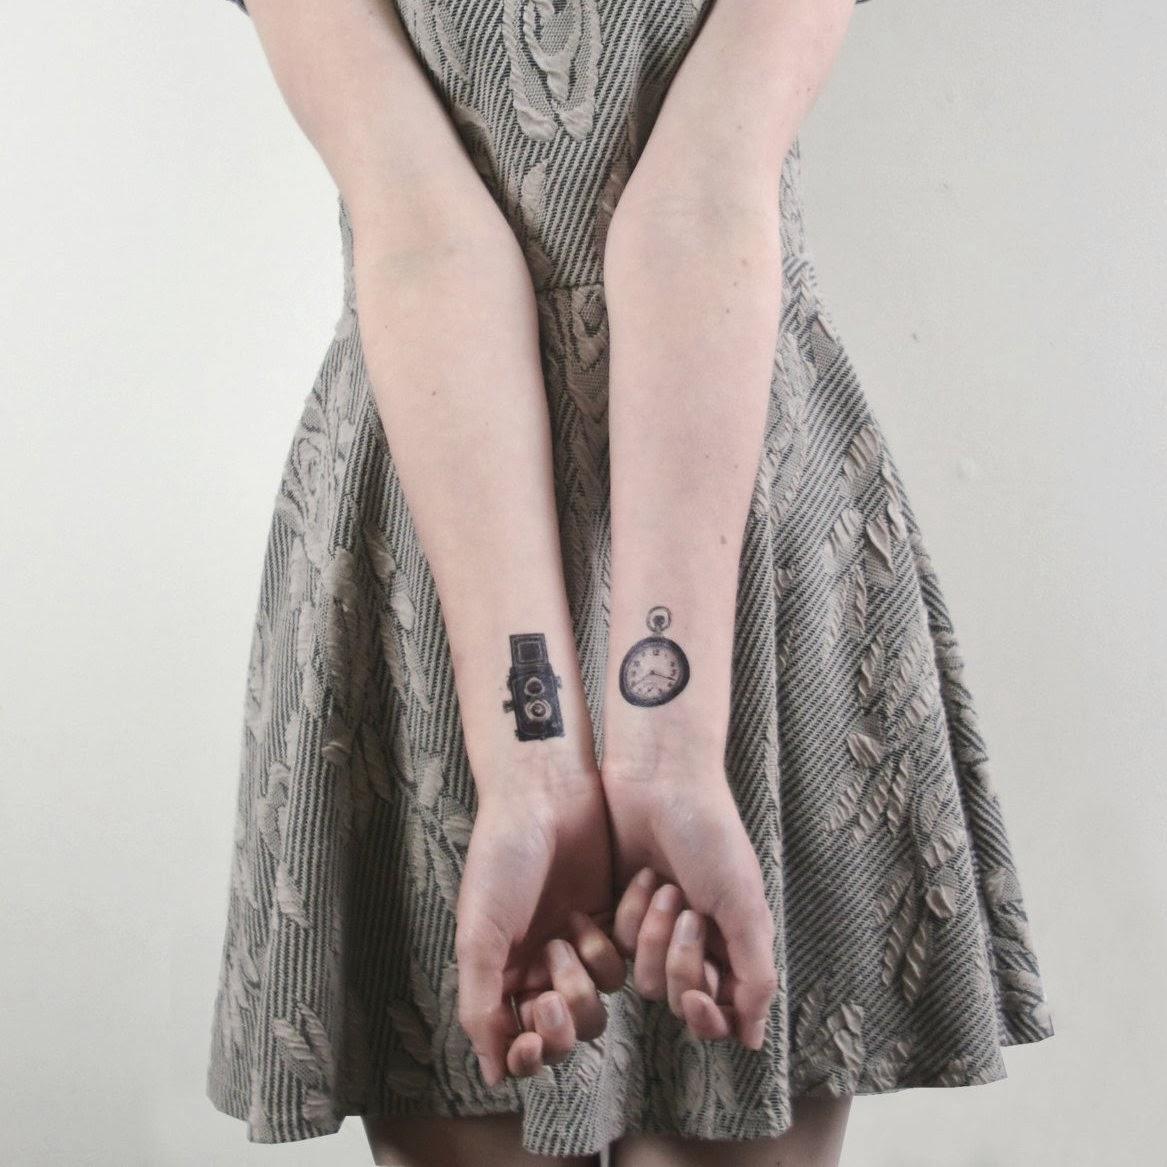 http://birdinborrowedfeathers.bigcartel.com/product/vintage-objects-temporary-tattoos-by-deborah-ballinger